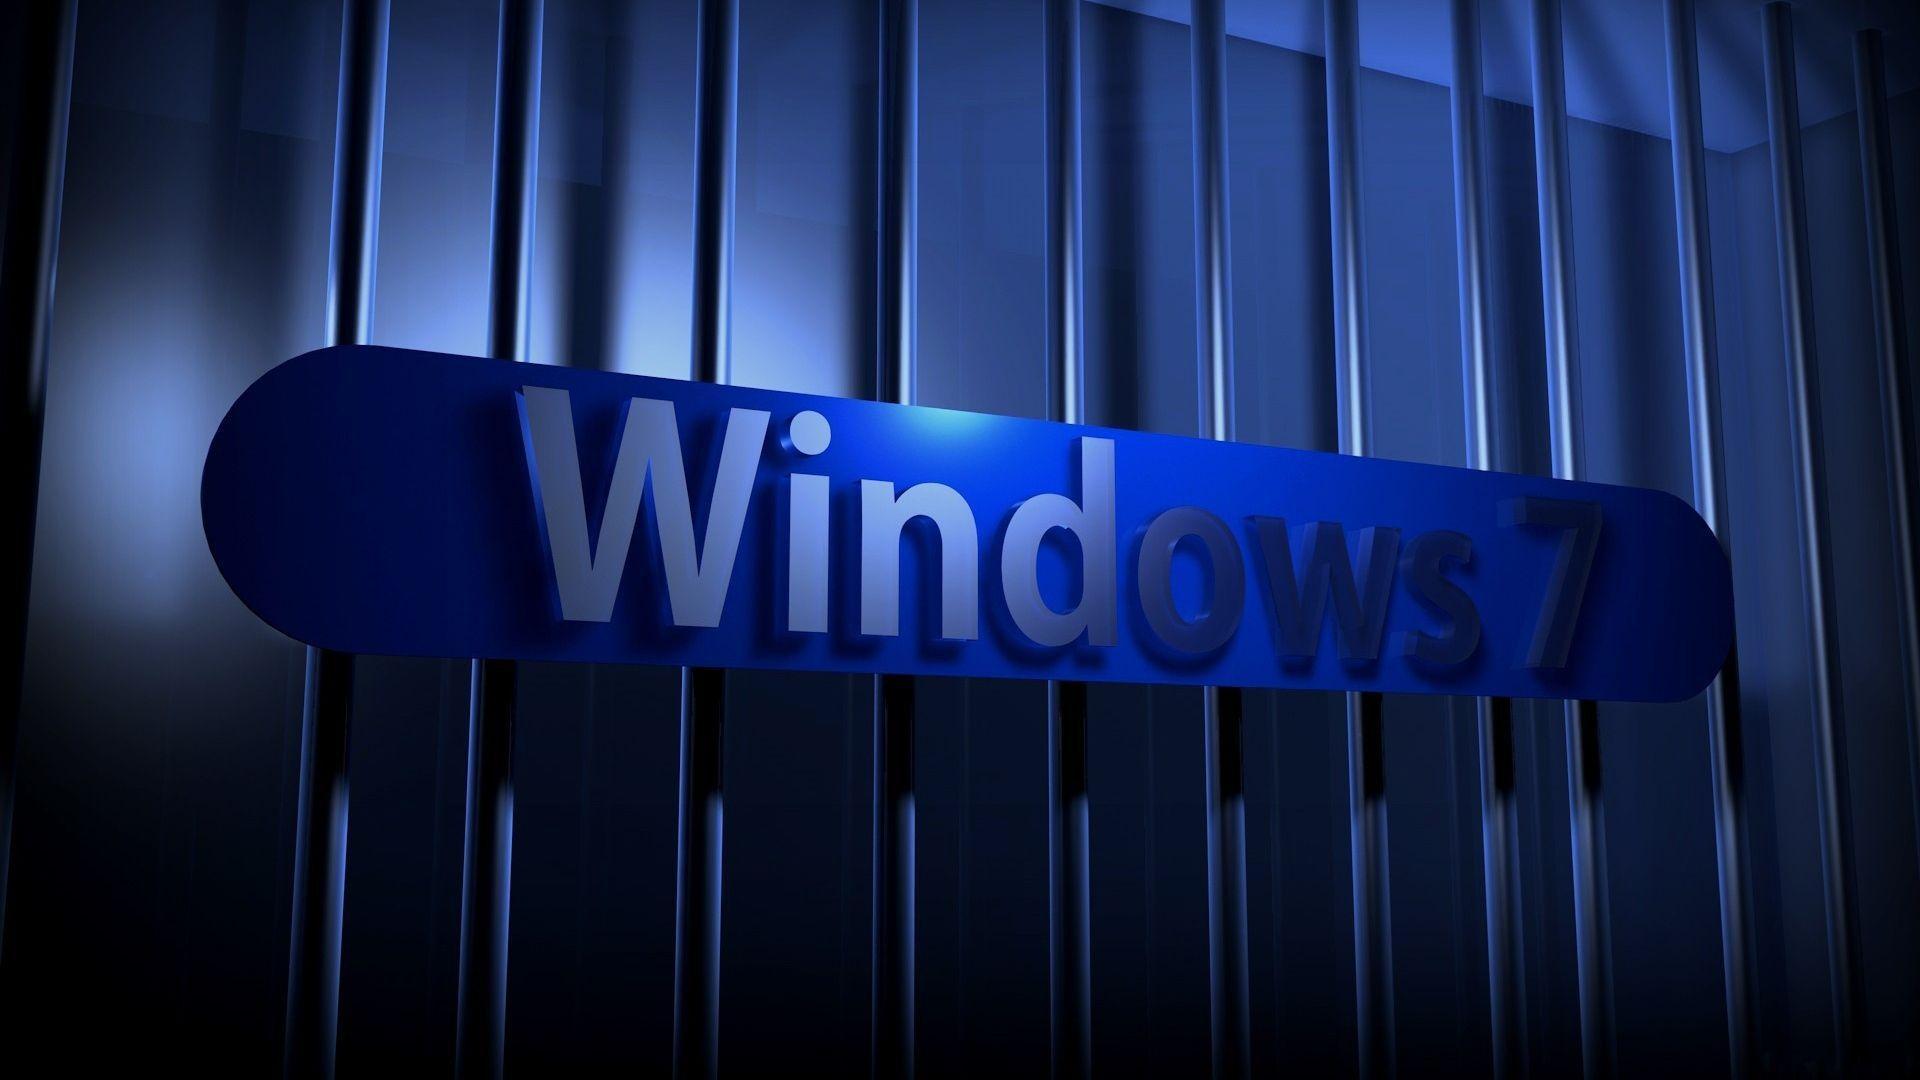 Windows 7 Pc Wallpapers Hd 1920x1080 Wallpaper Cave